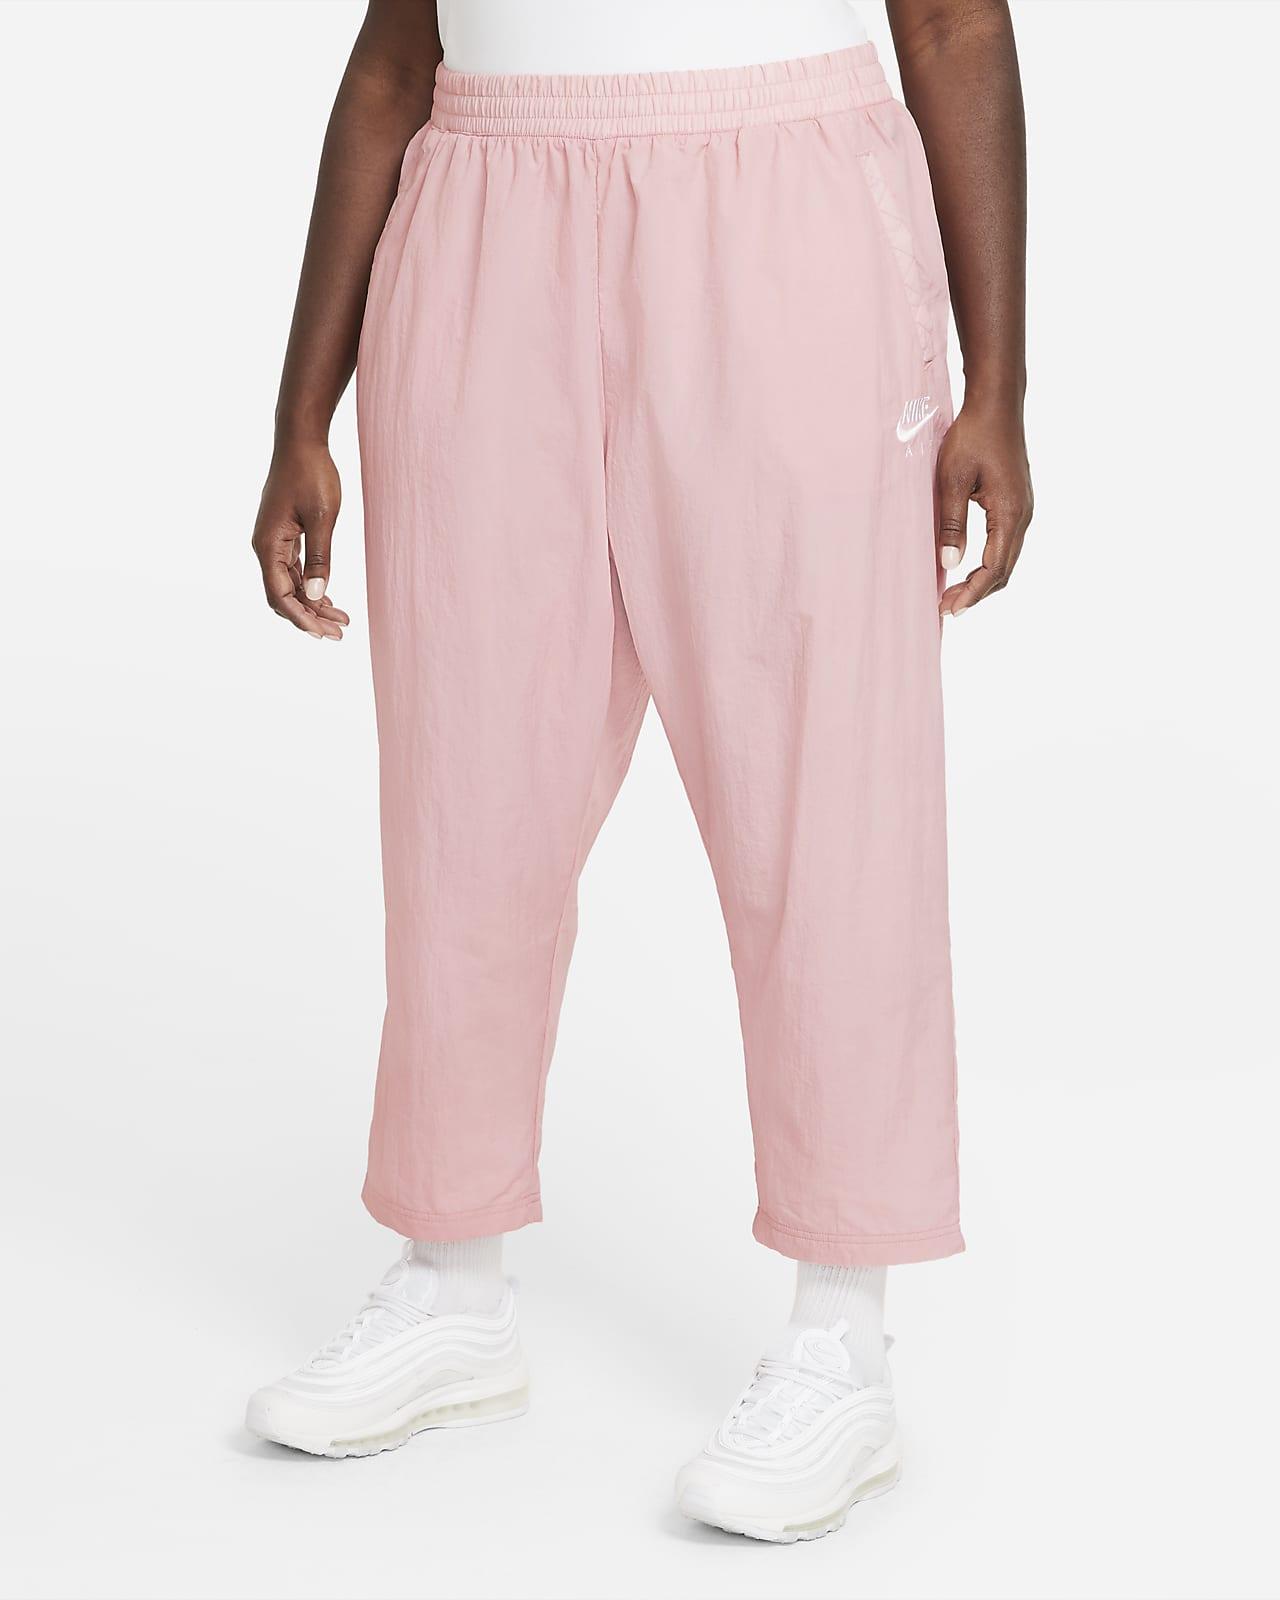 Damskie spodnie z tkaniny (duże rozmiary) Nike Air